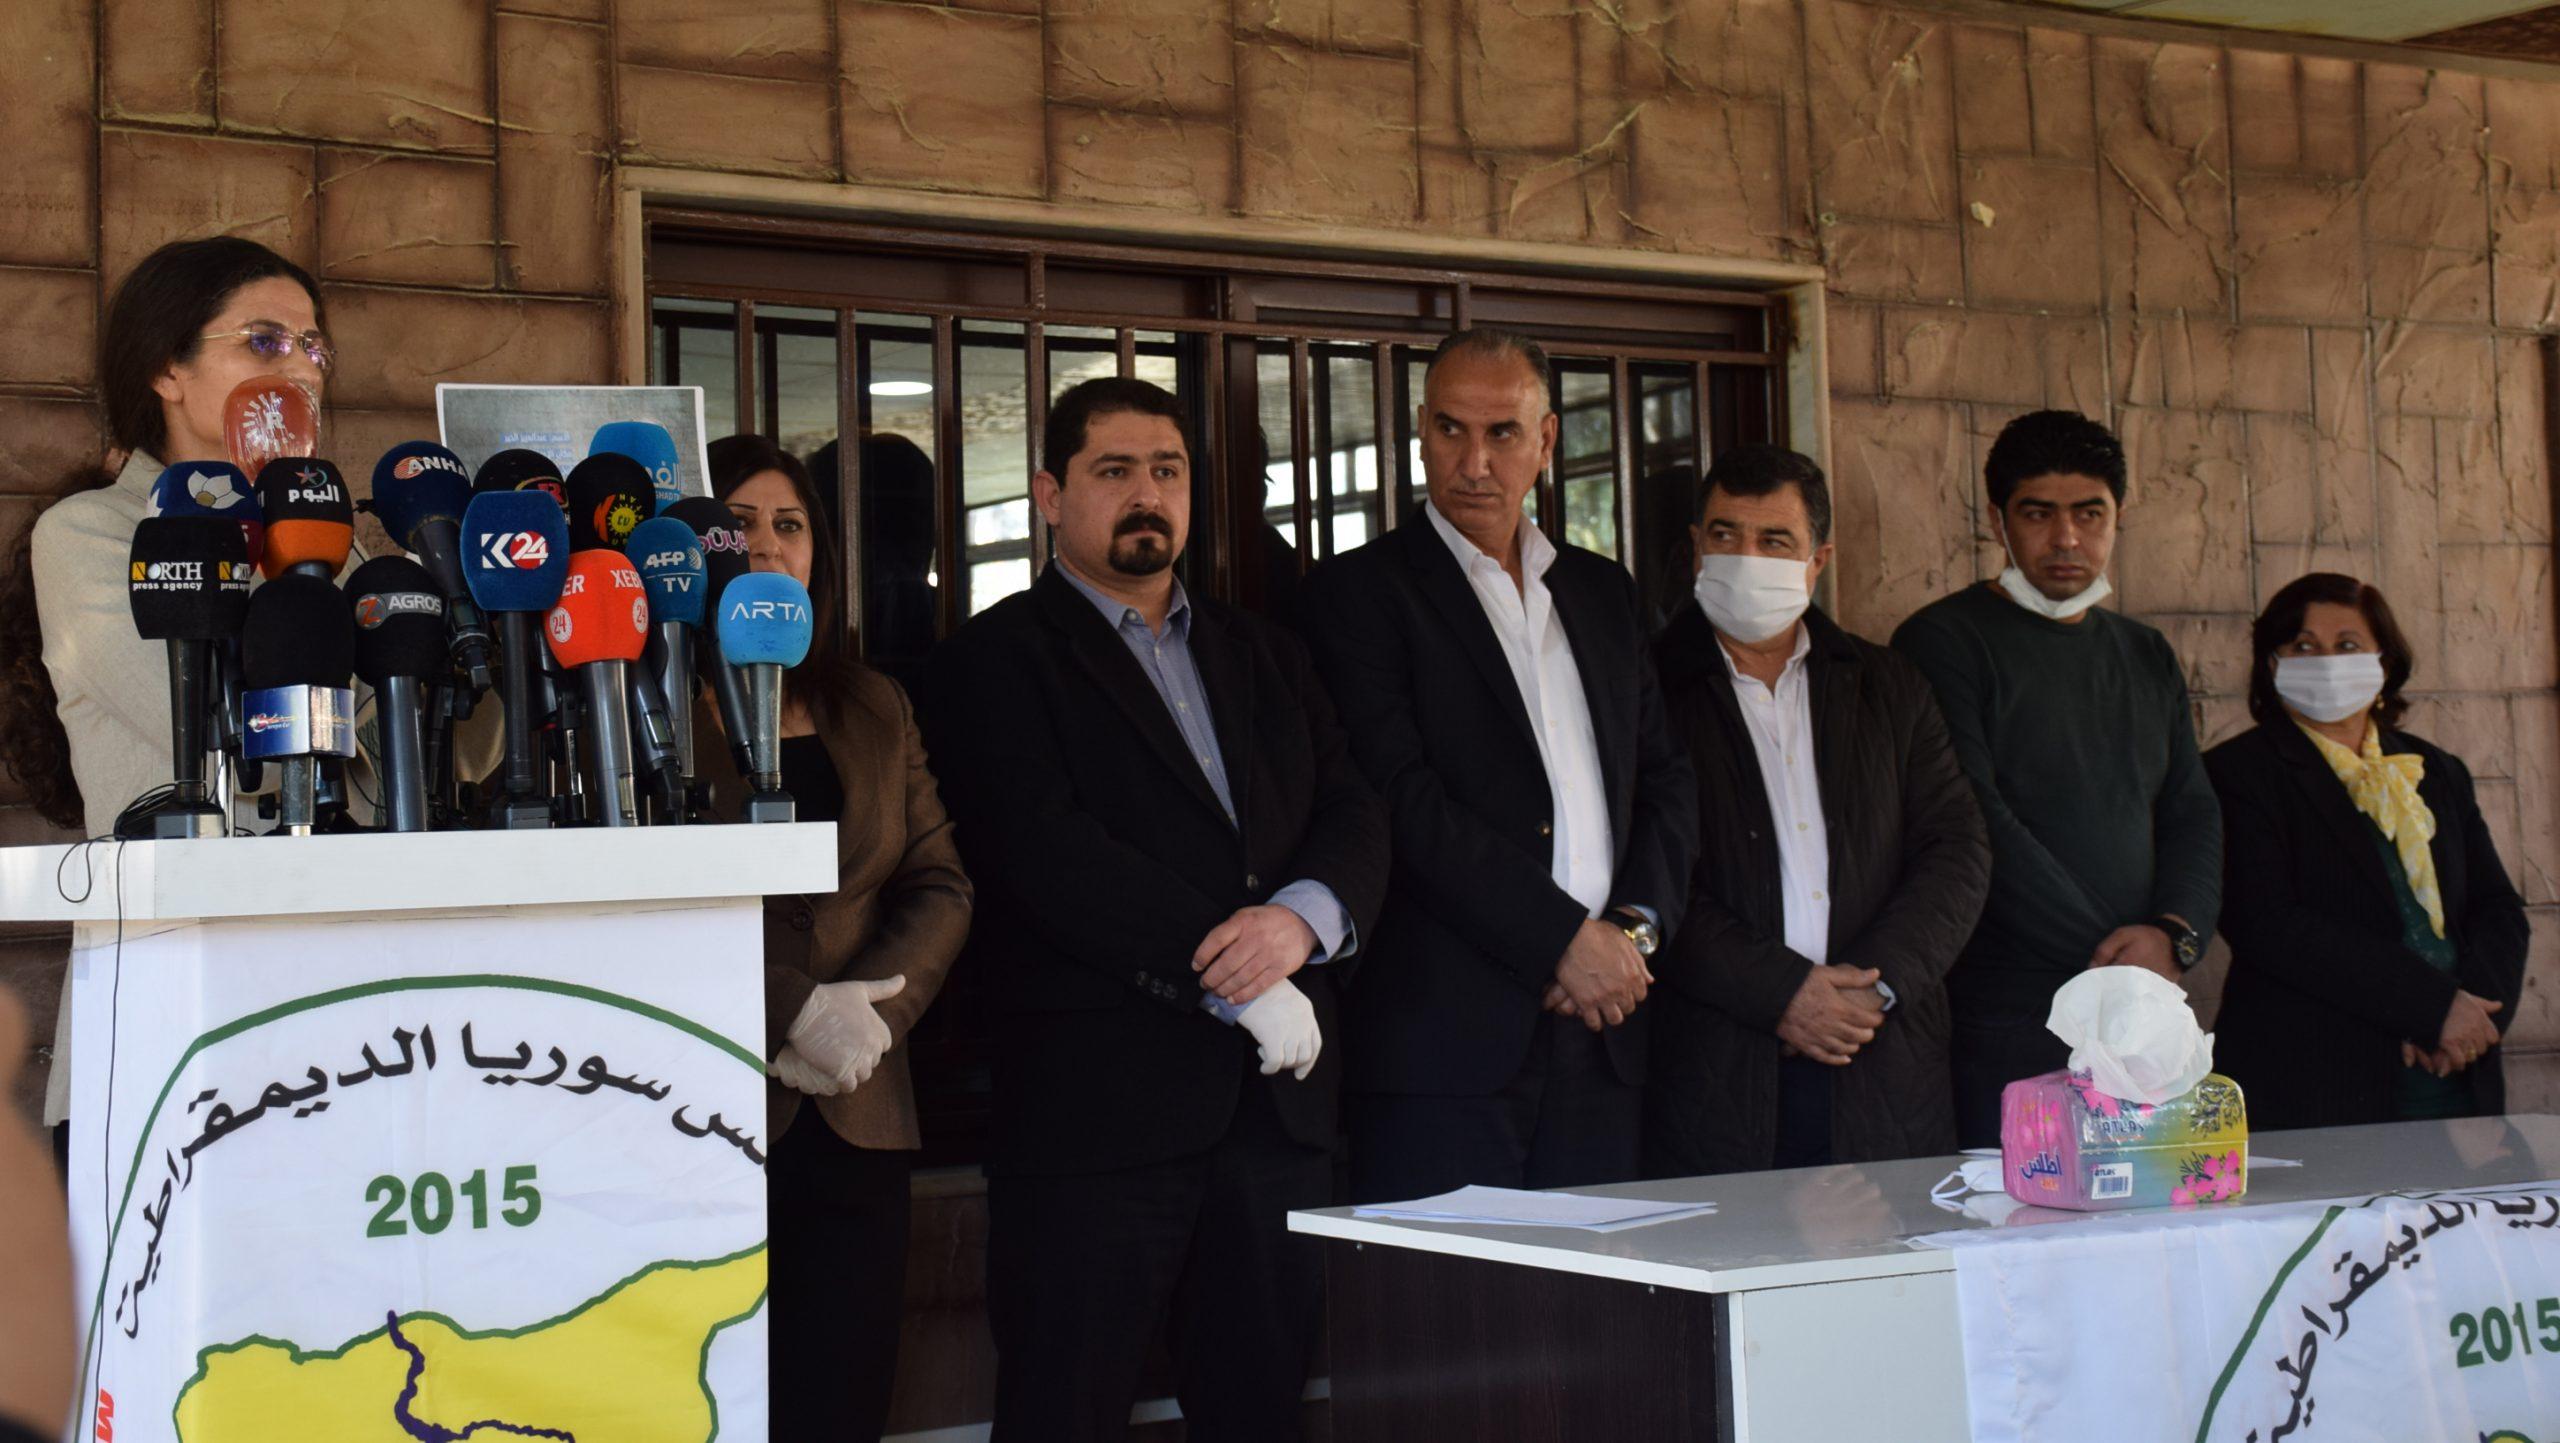 Photo of مجلس سوريا الديمقراطية يُعلن عن تشكيل لجنة لمتابعة ملف المعتقلين والمختطفين